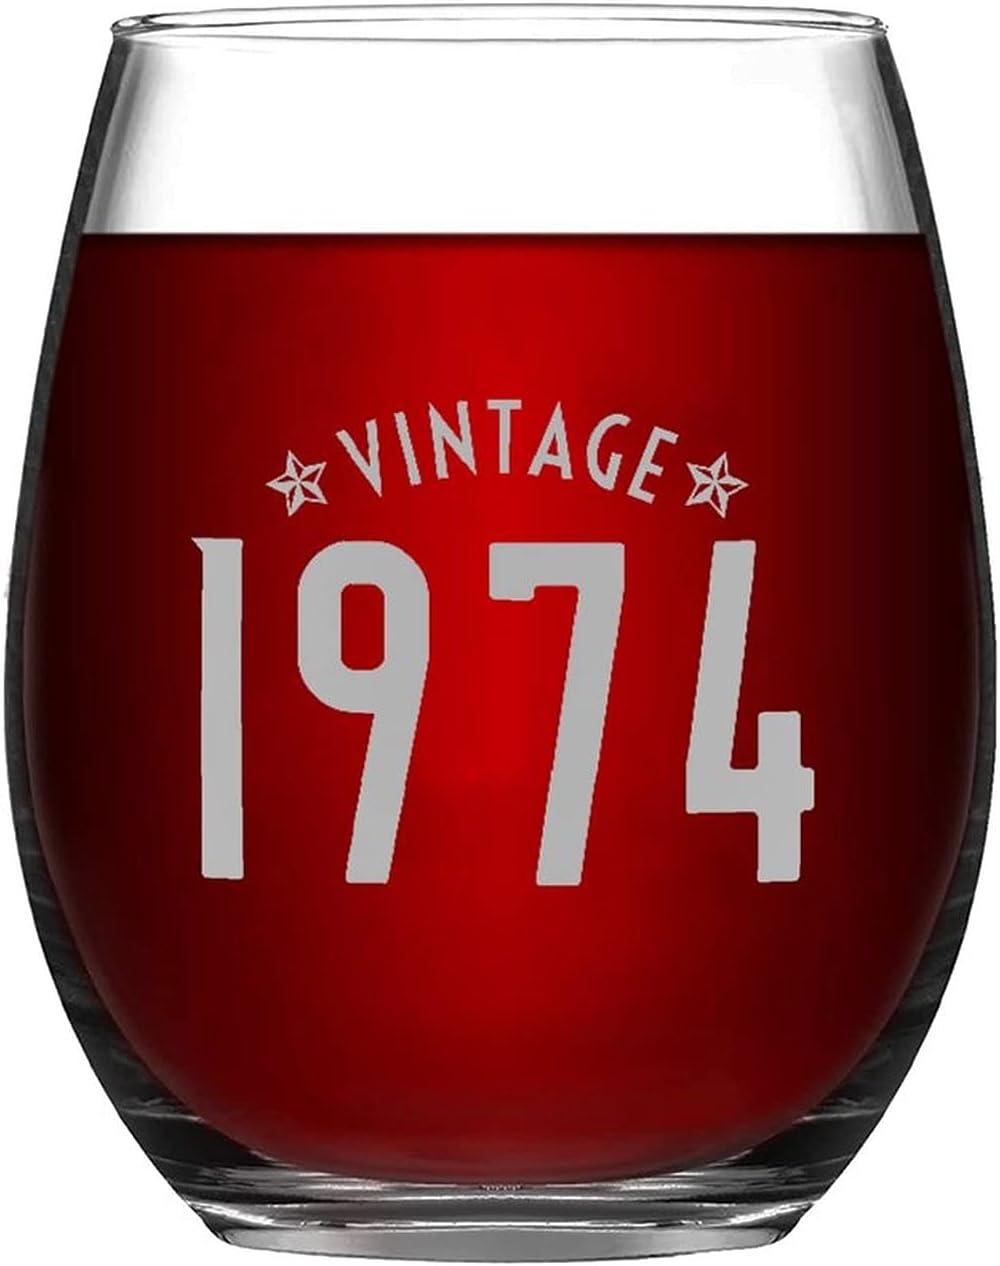 Funny Stemless Birthday Wine Save money Glass 11oz Branded goods 74 Vintage Drin Fabulous